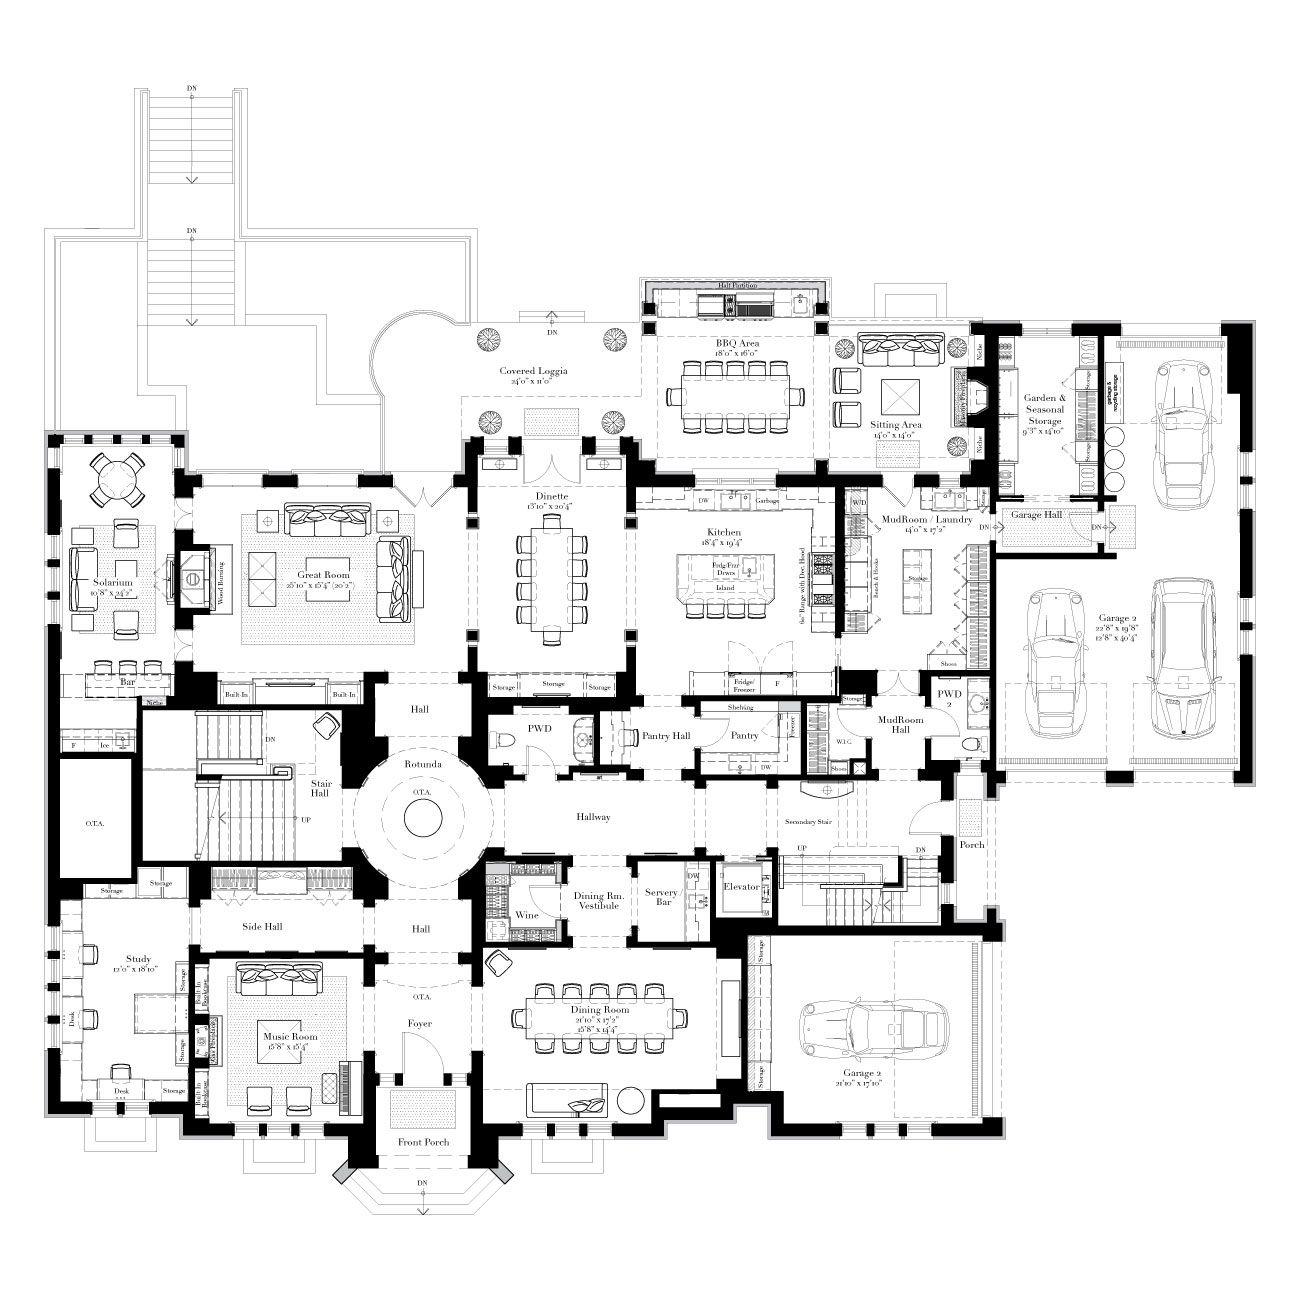 Mansion Floor Plans: The Balsam Estate Floorplan